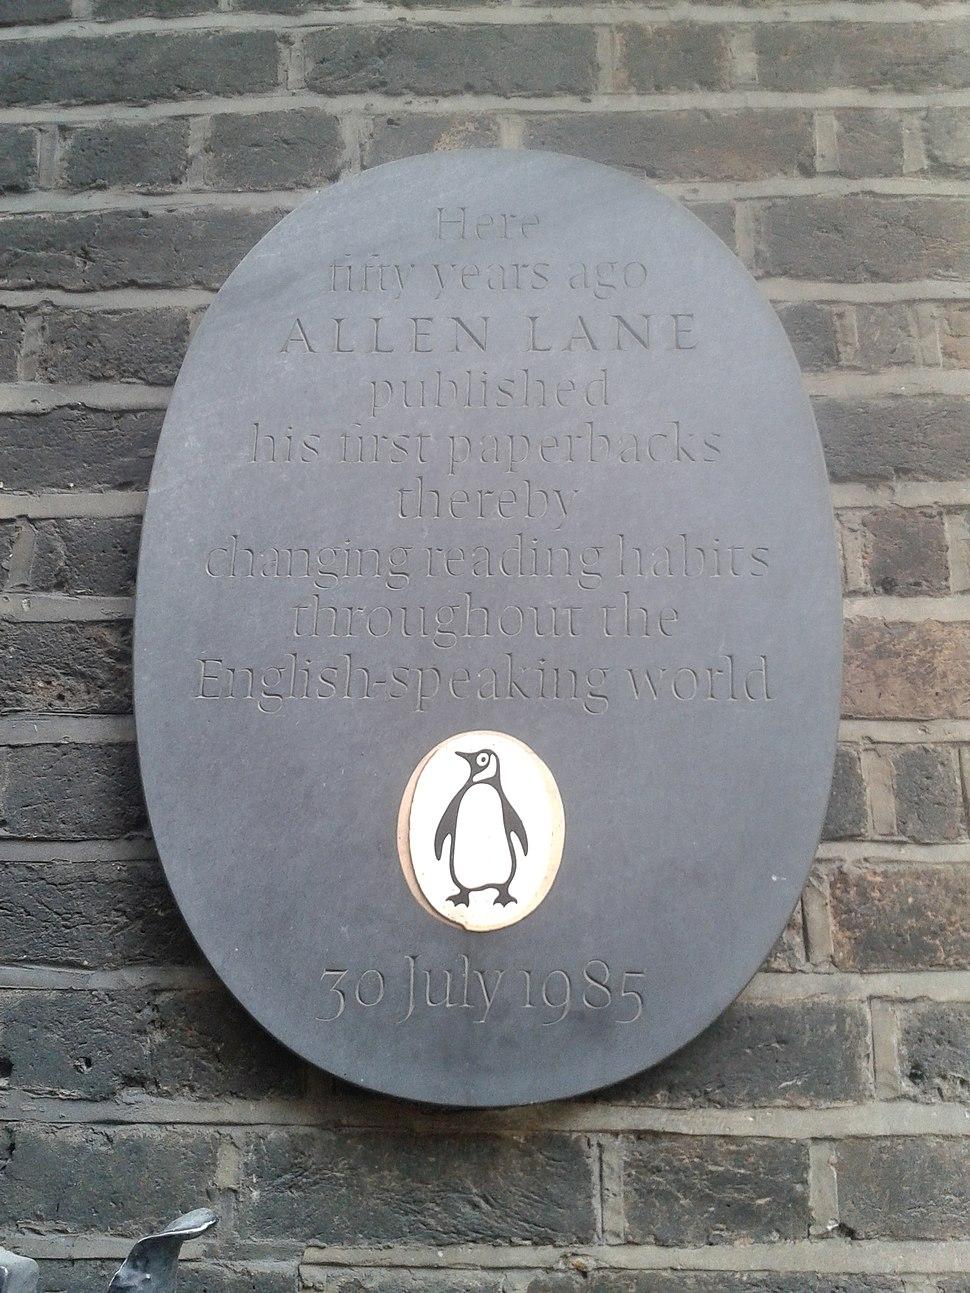 Allen Lane Penguin plaque 8 Vigo Street